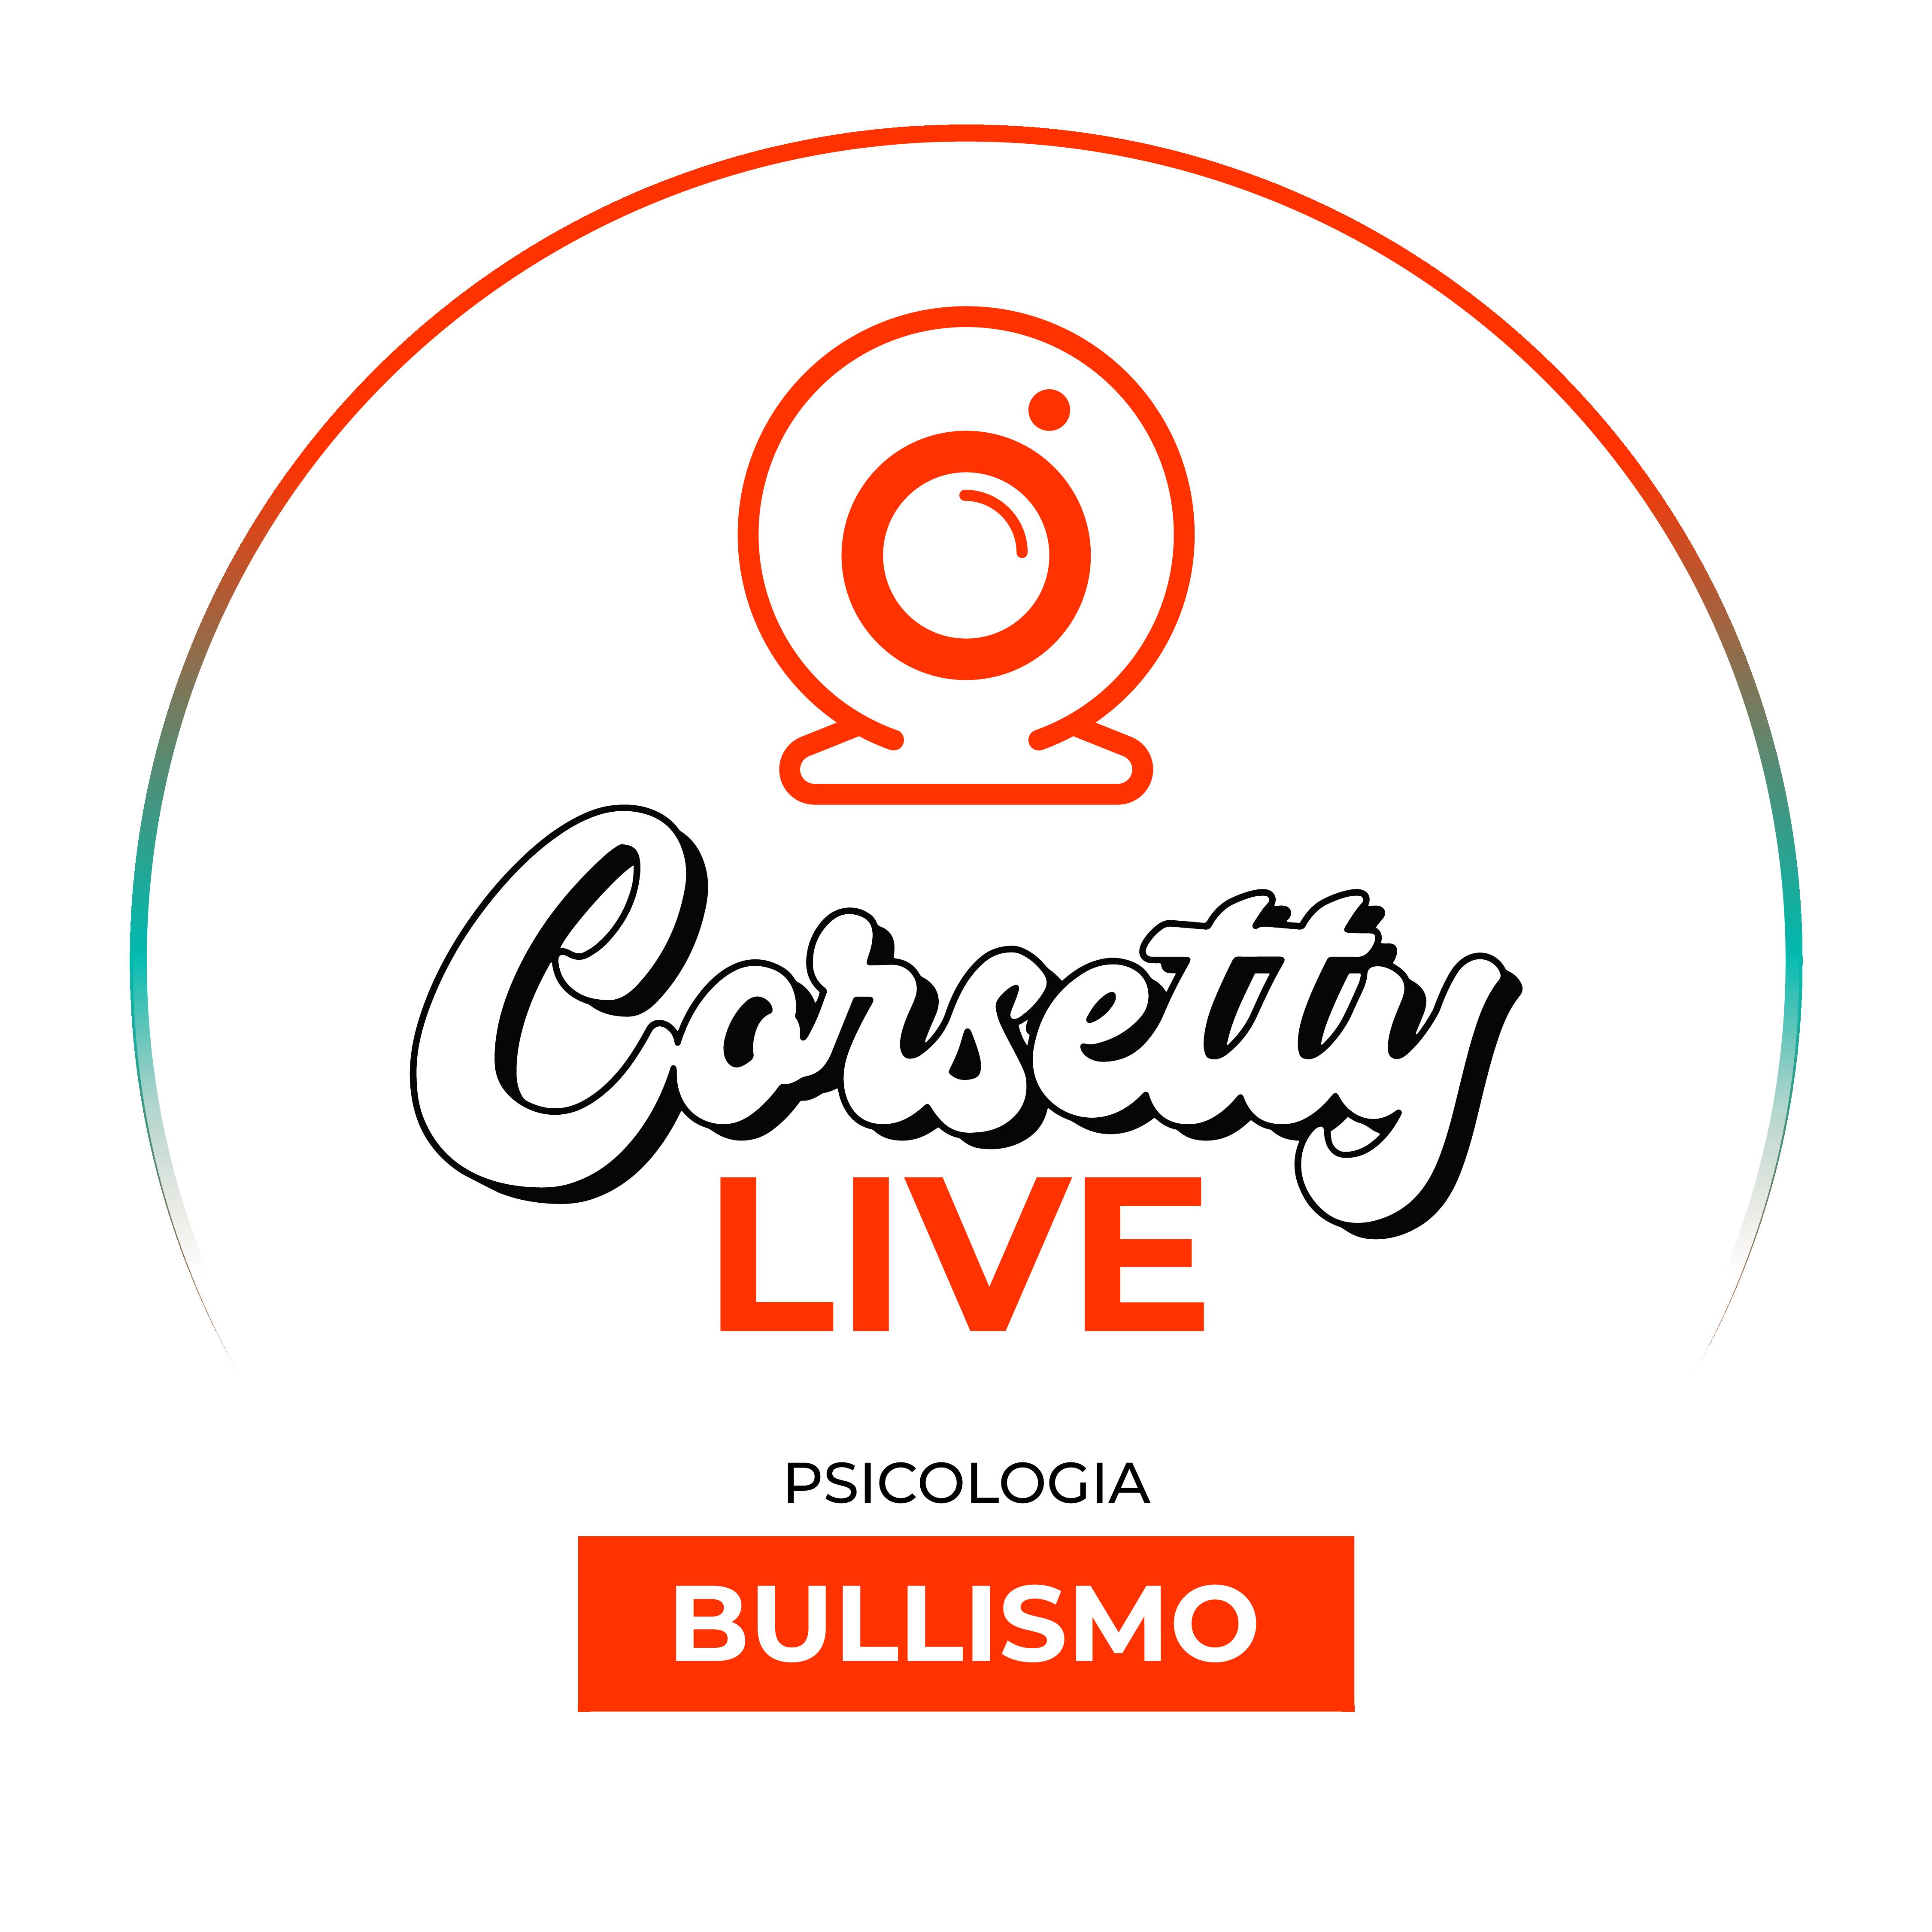 Corsetty – live: BULLISMO